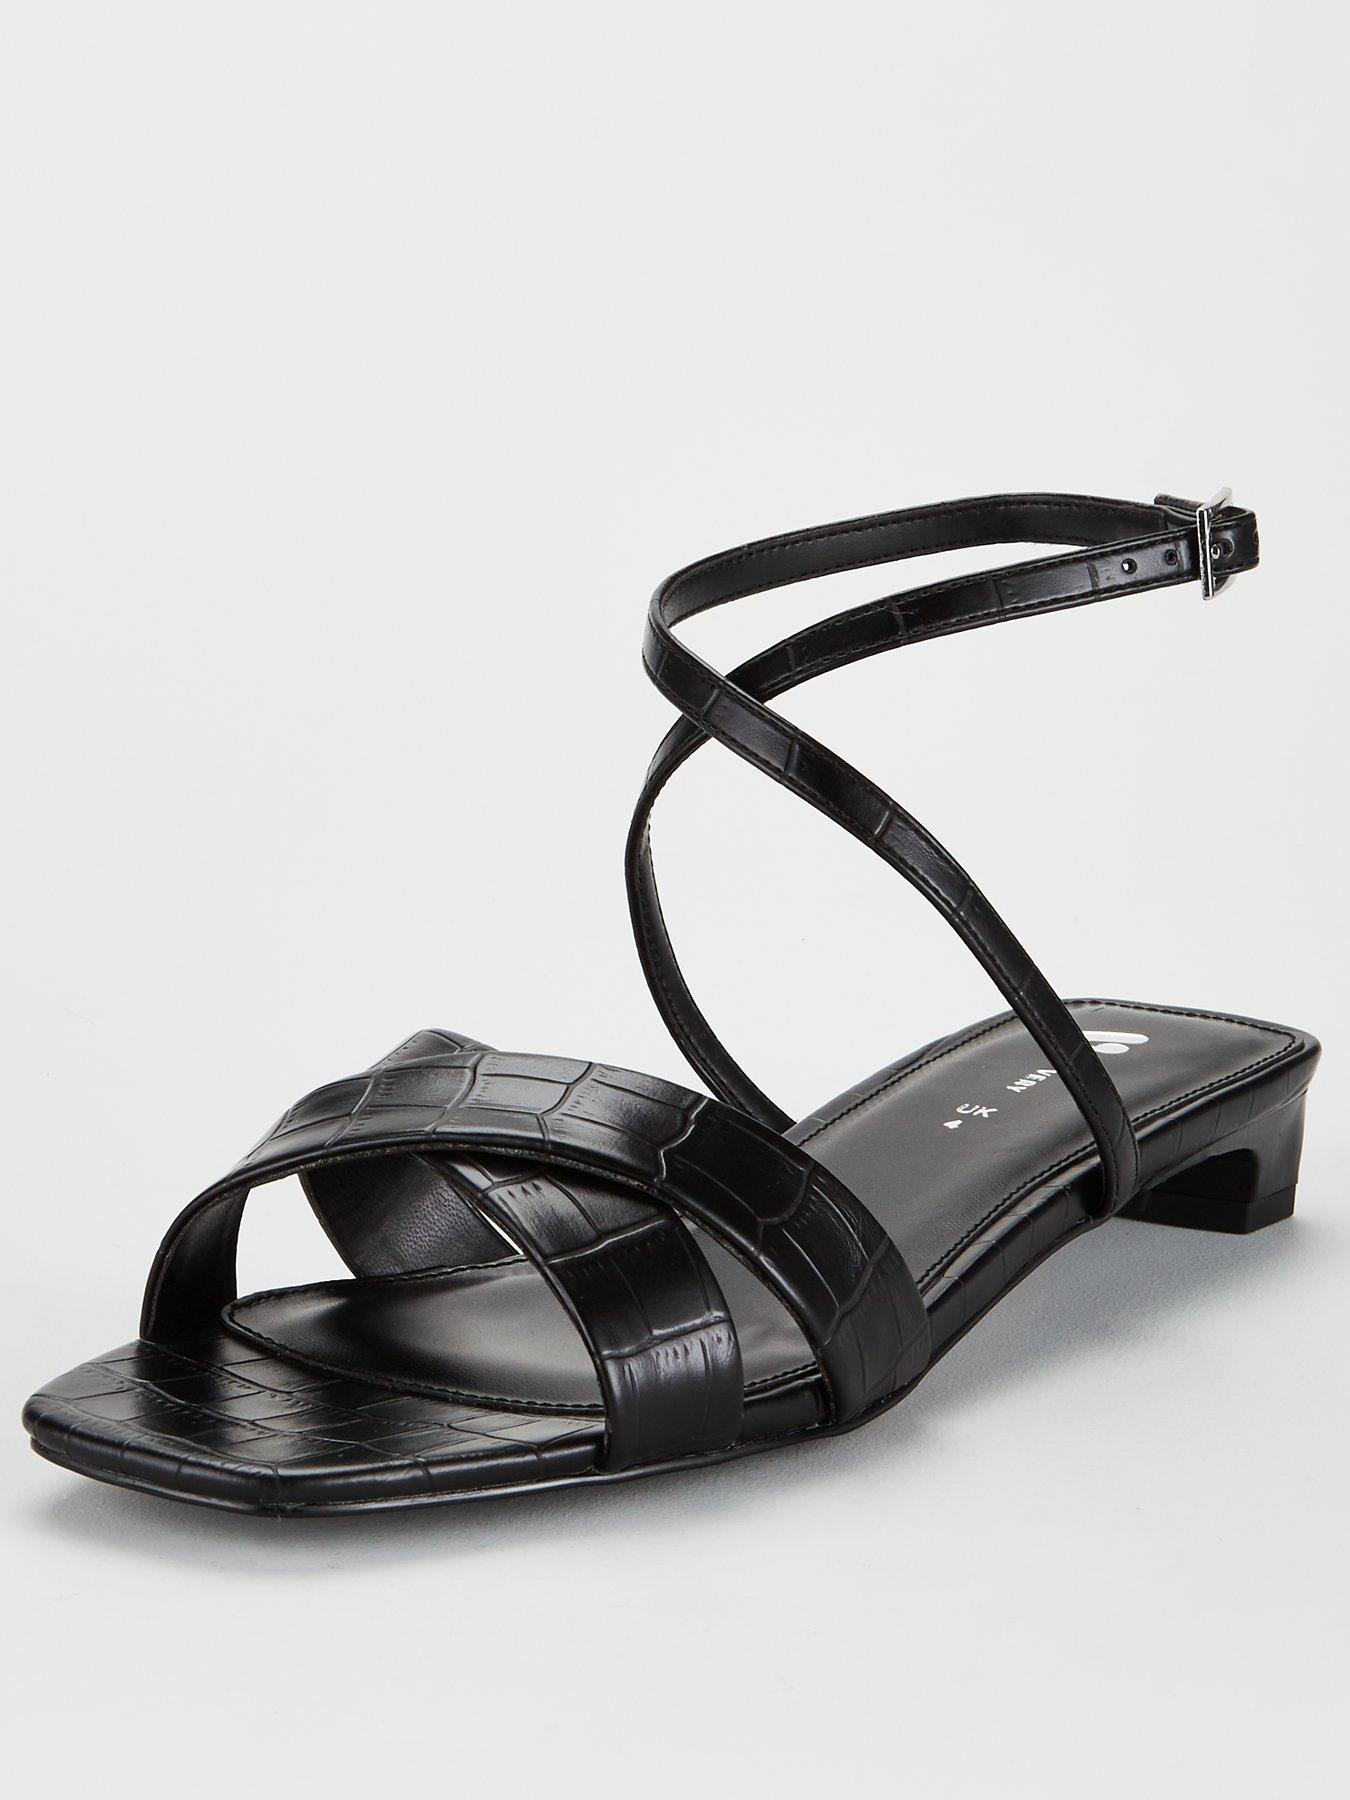 flip flops | Shoes \u0026 boots | Women